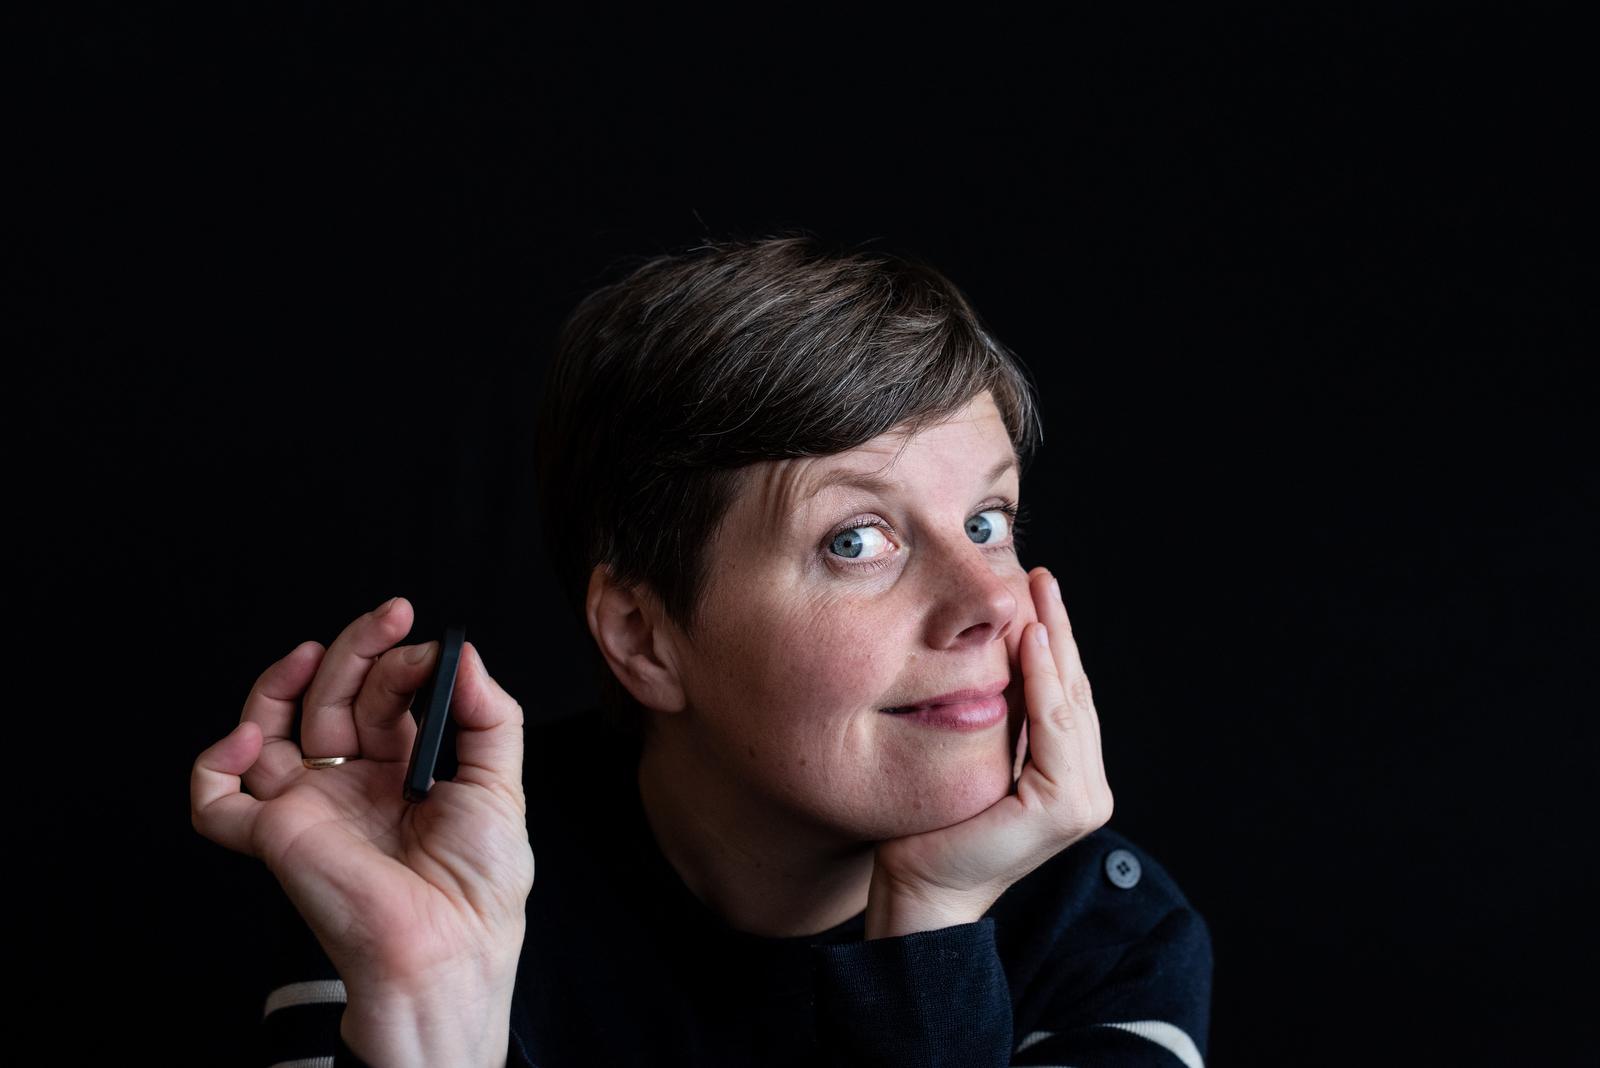 Kristine Nyborg